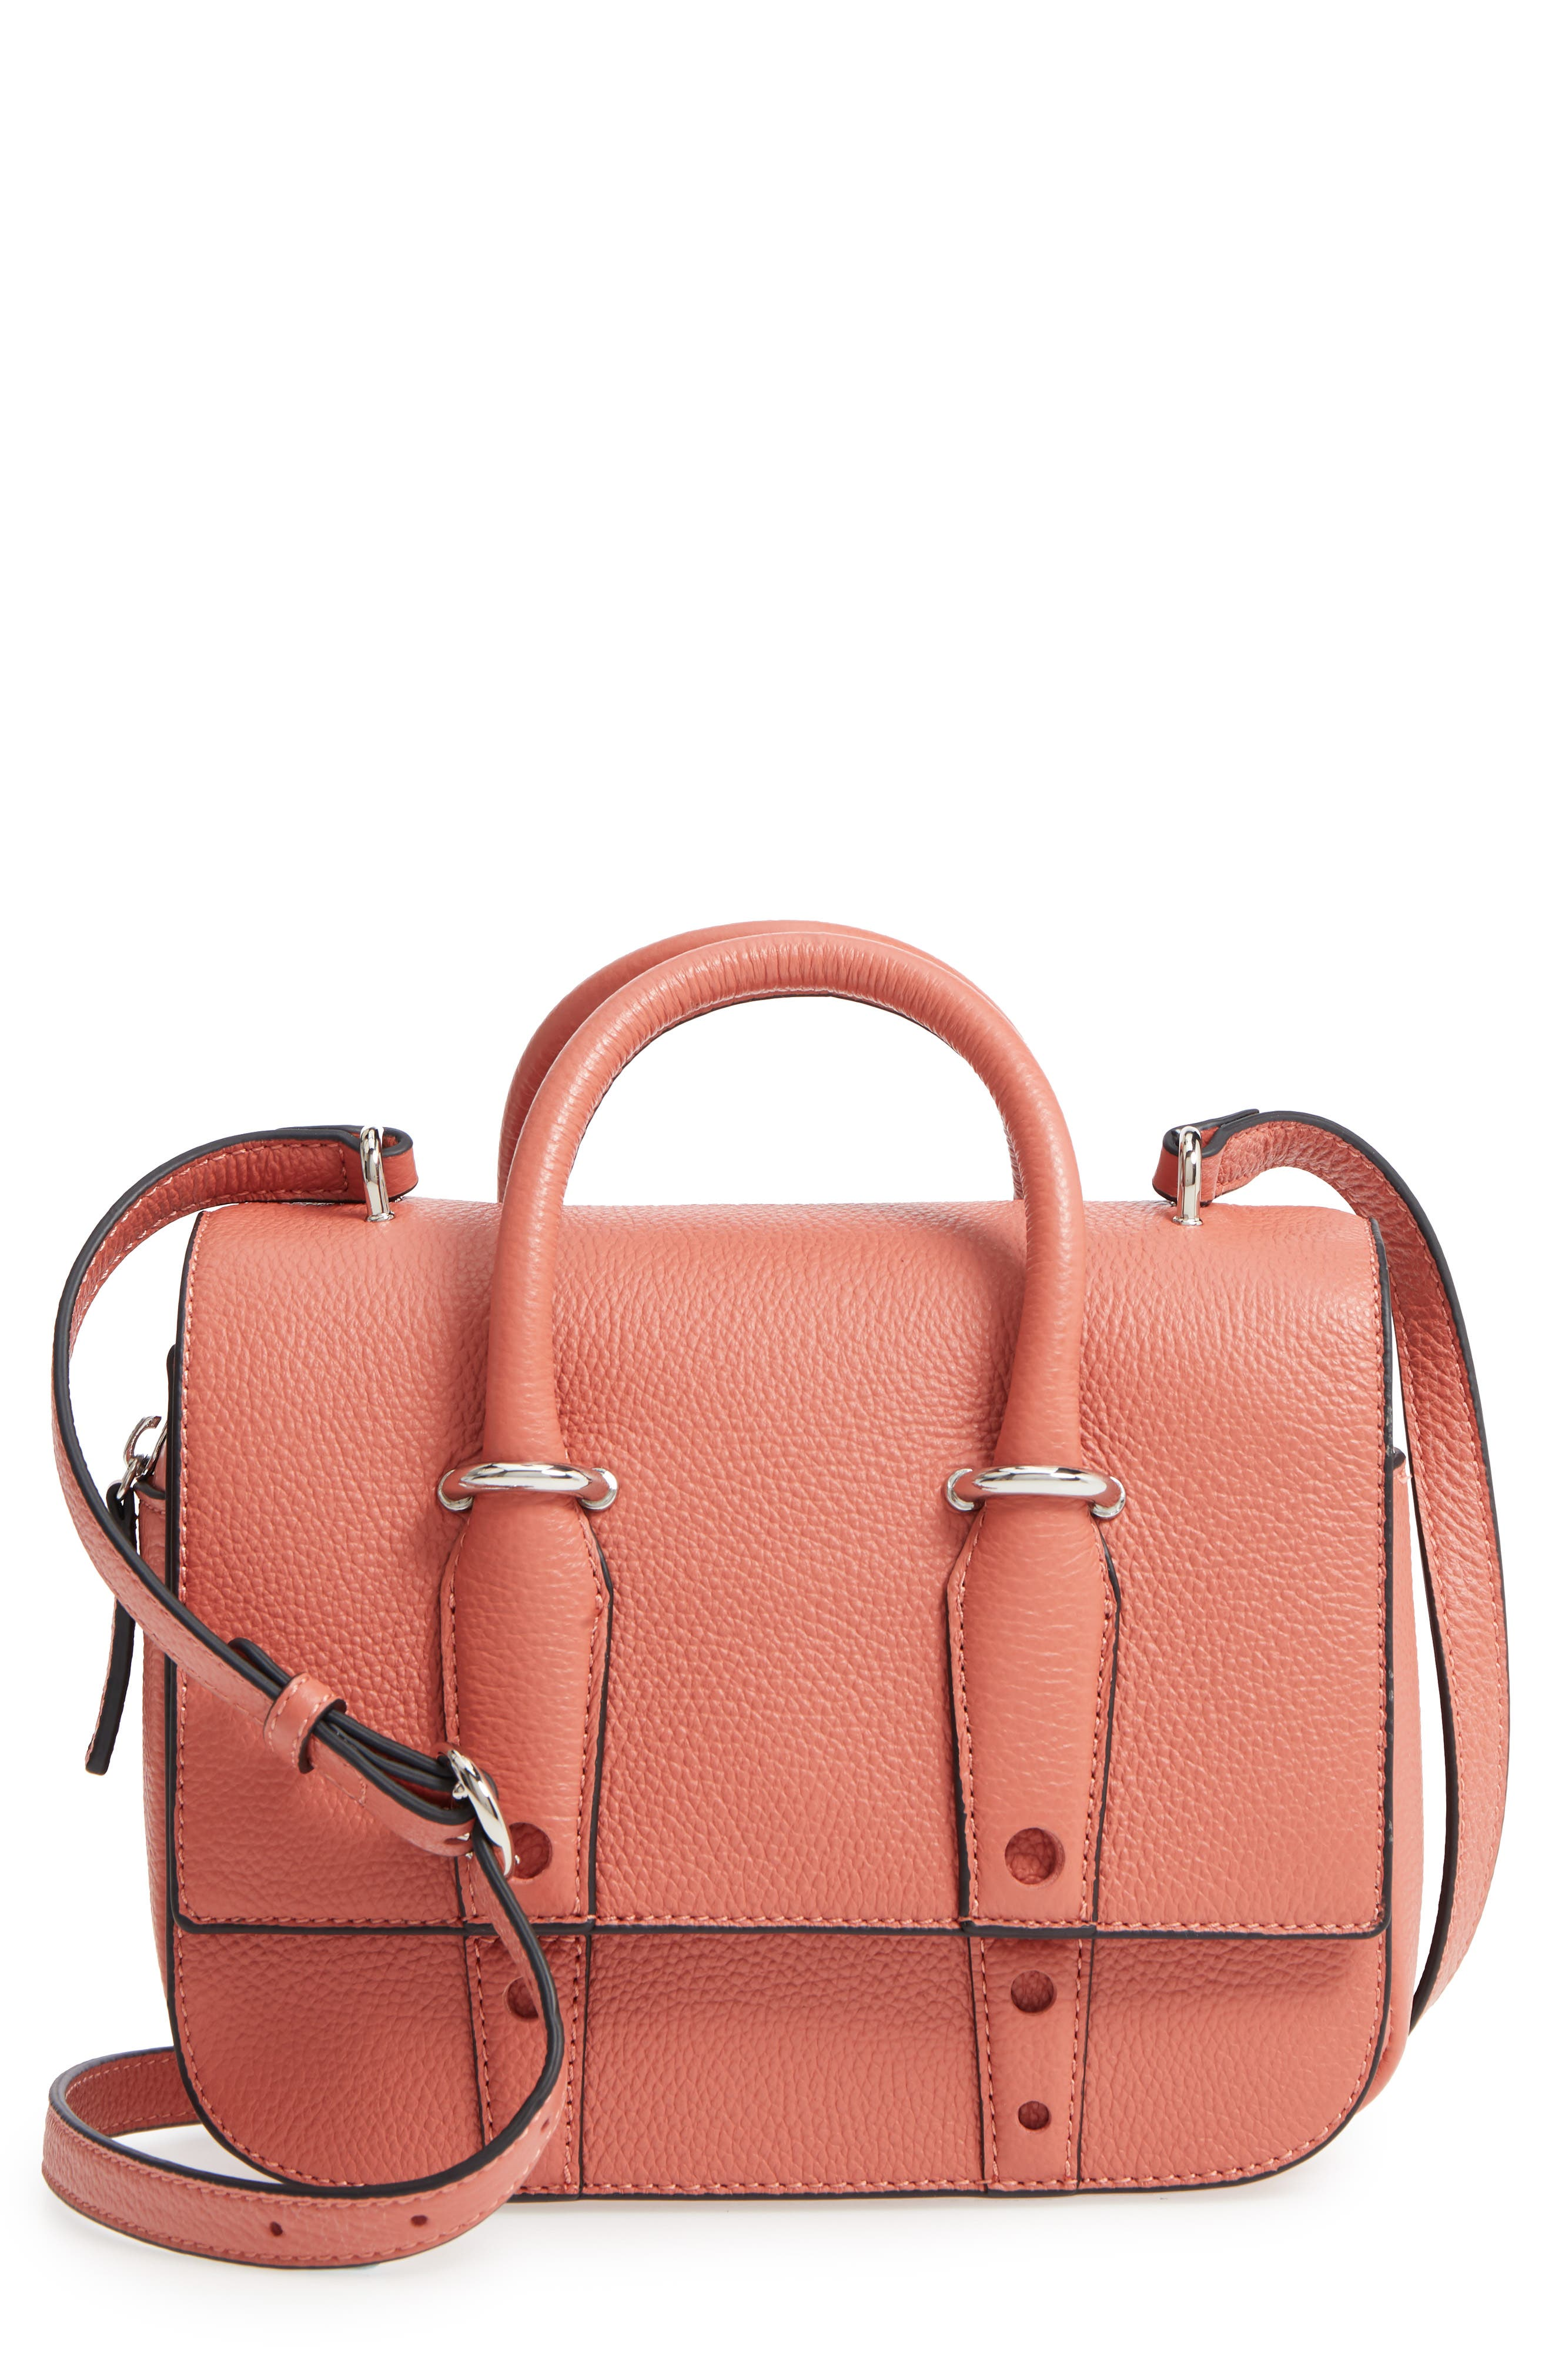 DANIELLE NICOLE Kinsley Leather Crossbody Bag, Main, color, 600